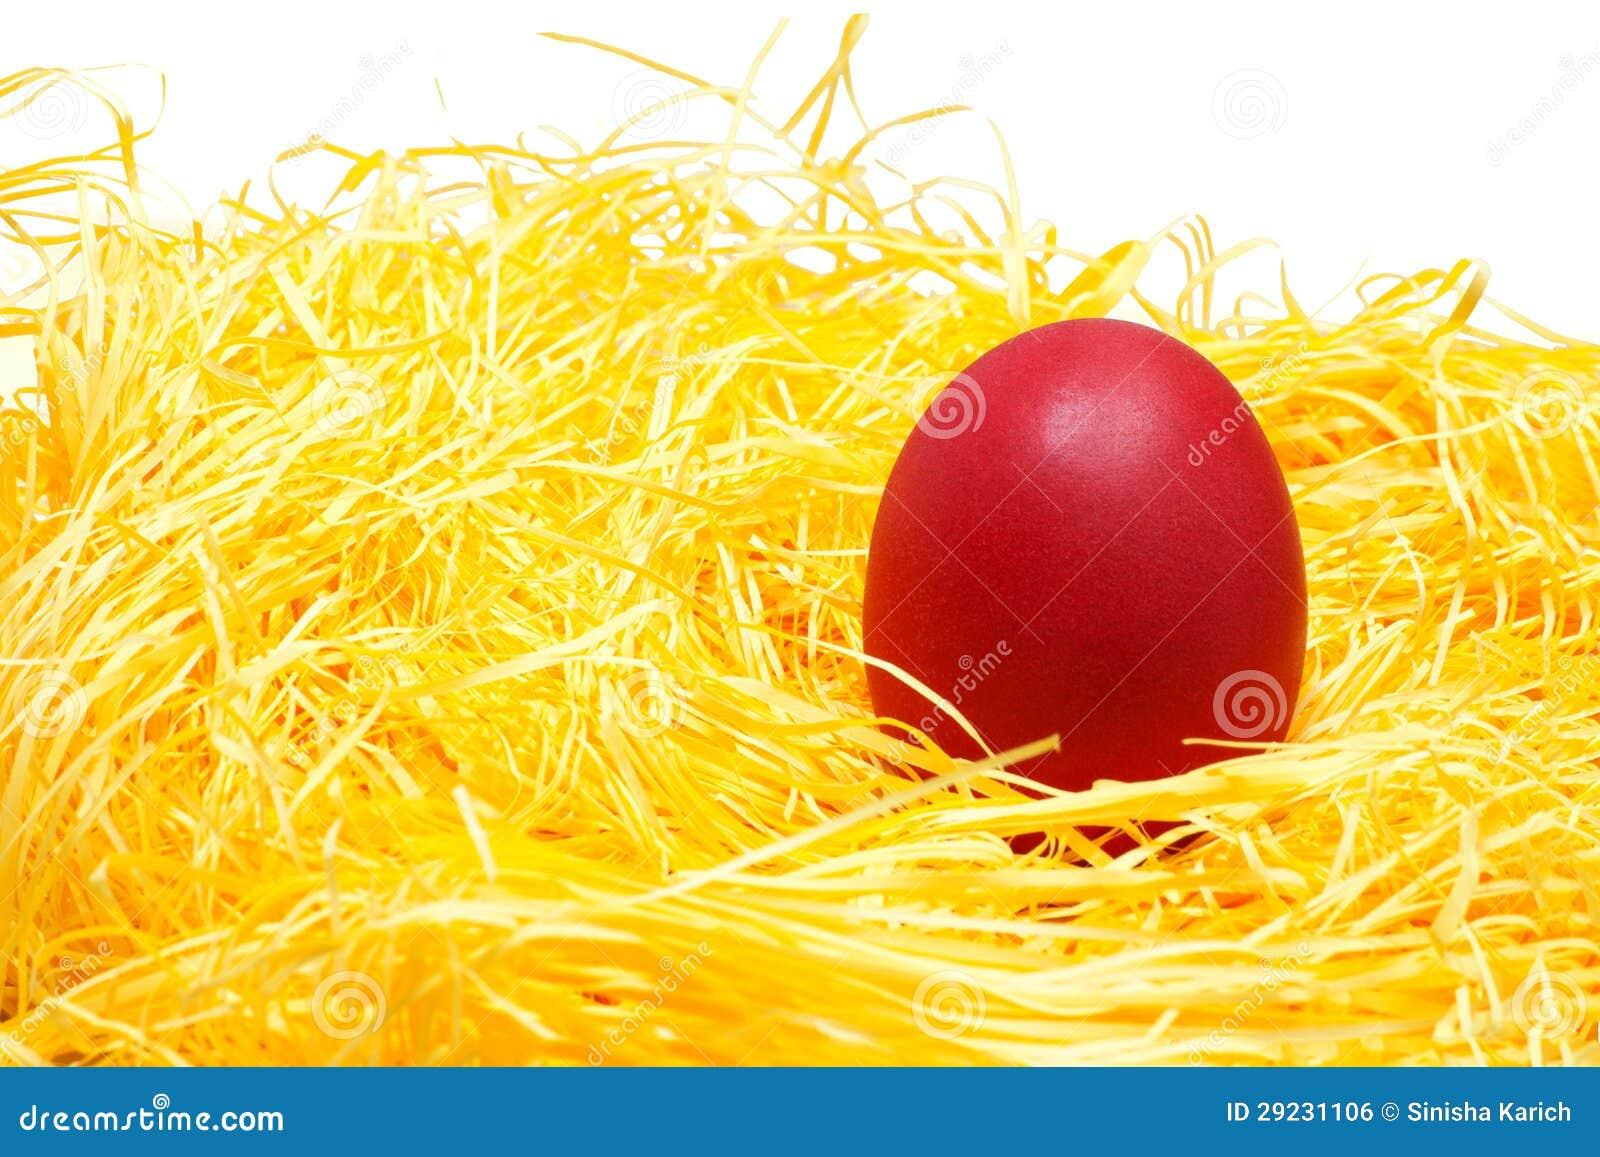 Download Easter foto de stock. Imagem de decorativo, bonito, conceito - 29231106